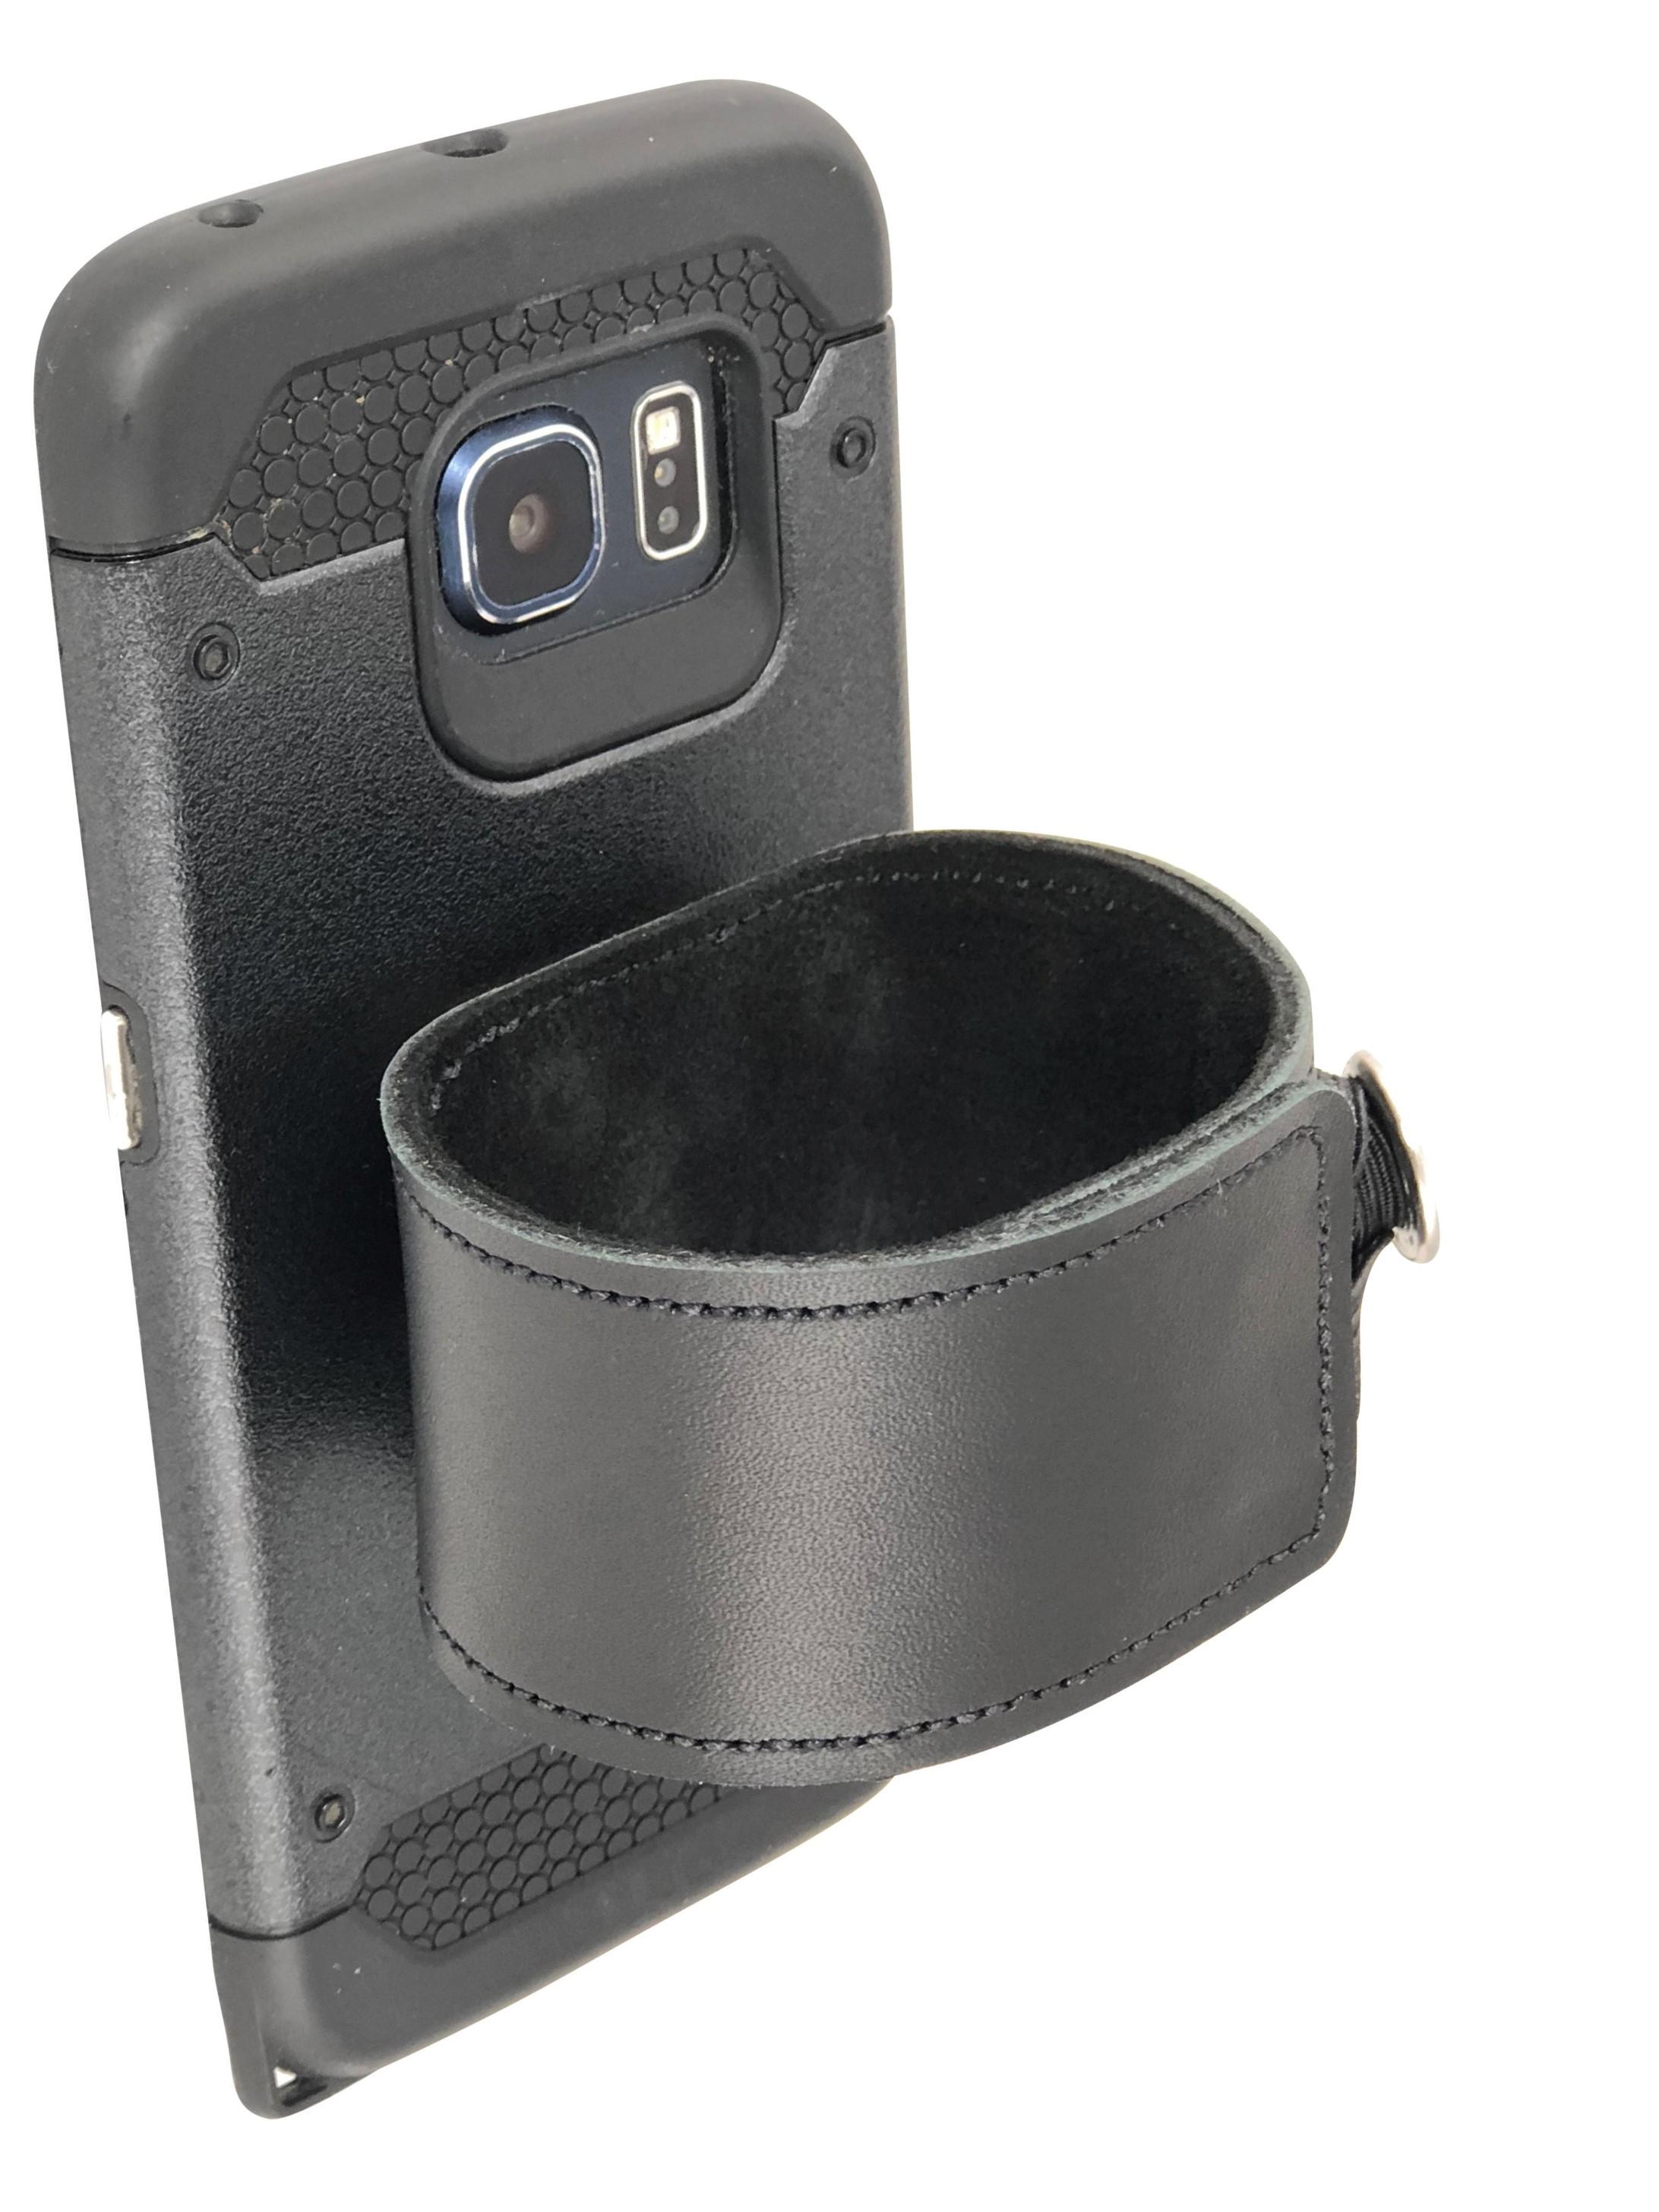 WristMC Black (Phone on wrist, arm band, wrist holster, watch band) by NewAgeNerds Co.